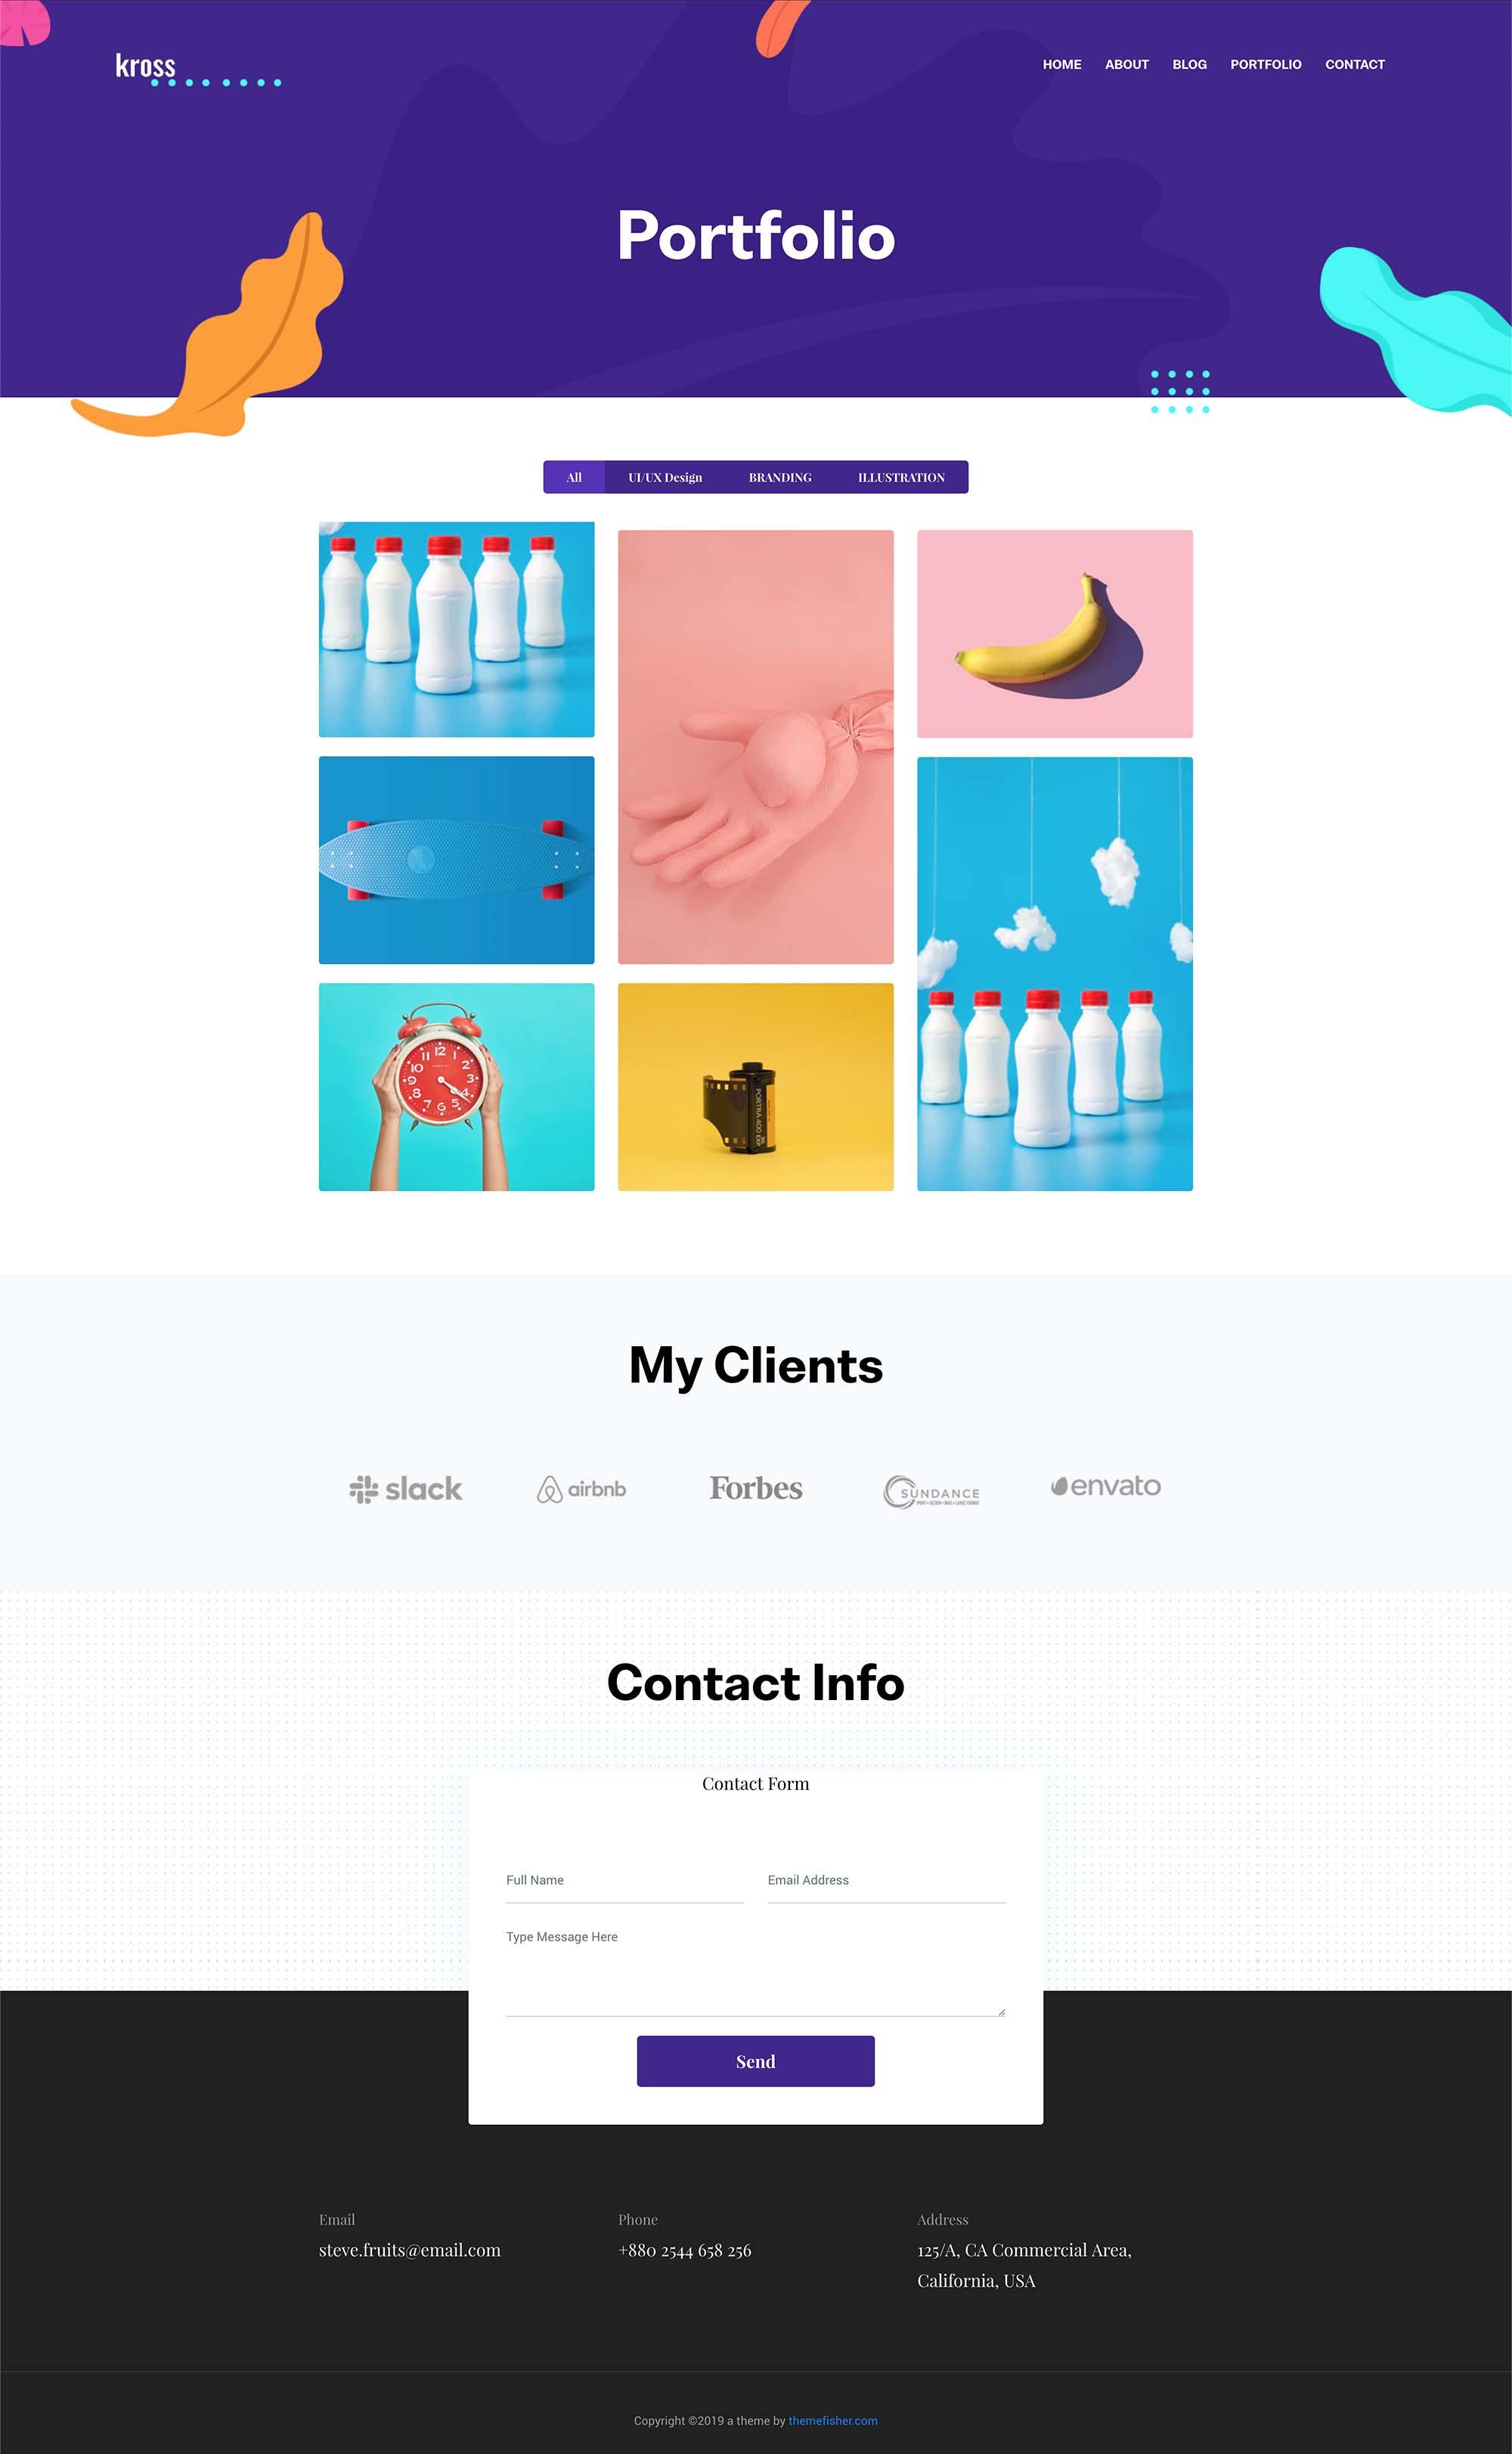 Free Kross Creative Portfolio Website Template (PSD)